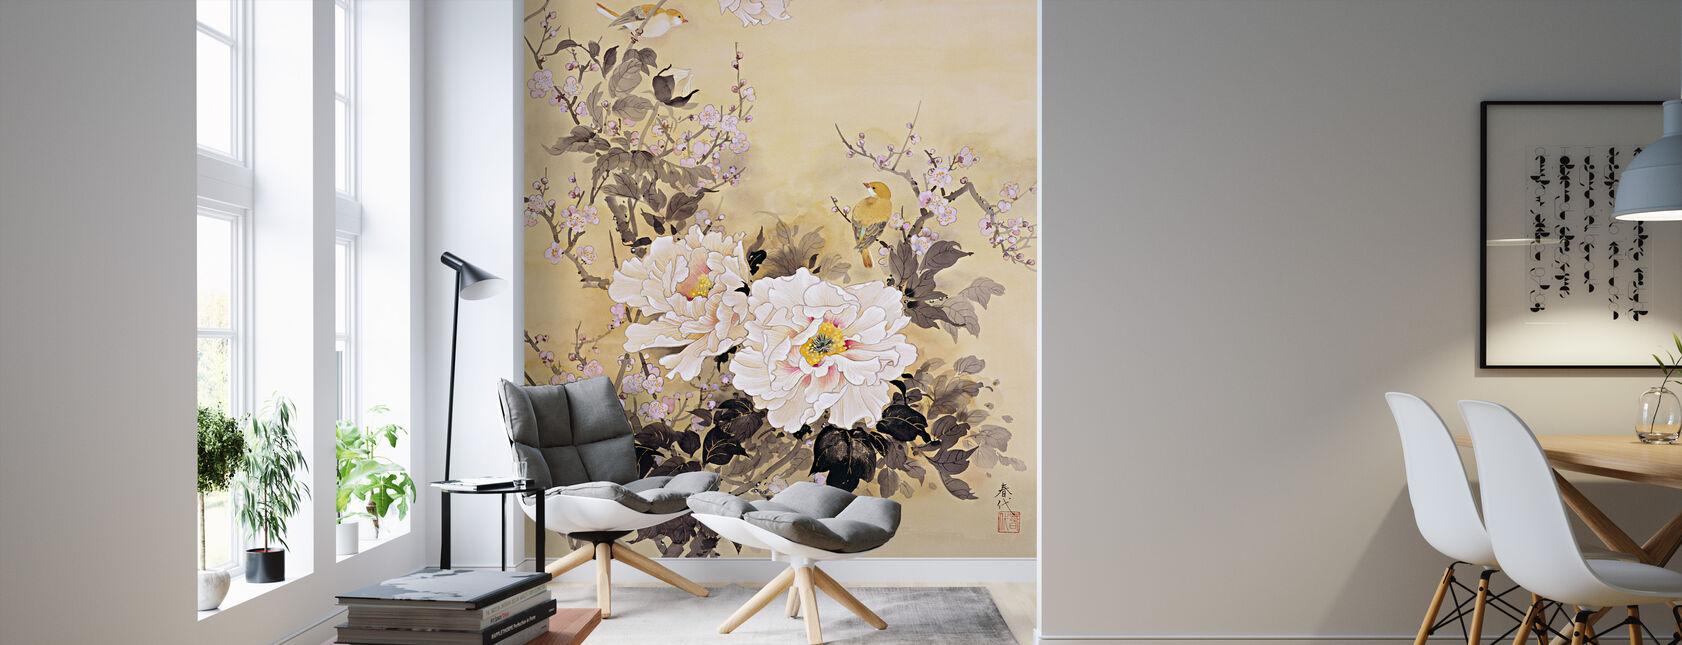 Forår Blossom - Tapet - Stue